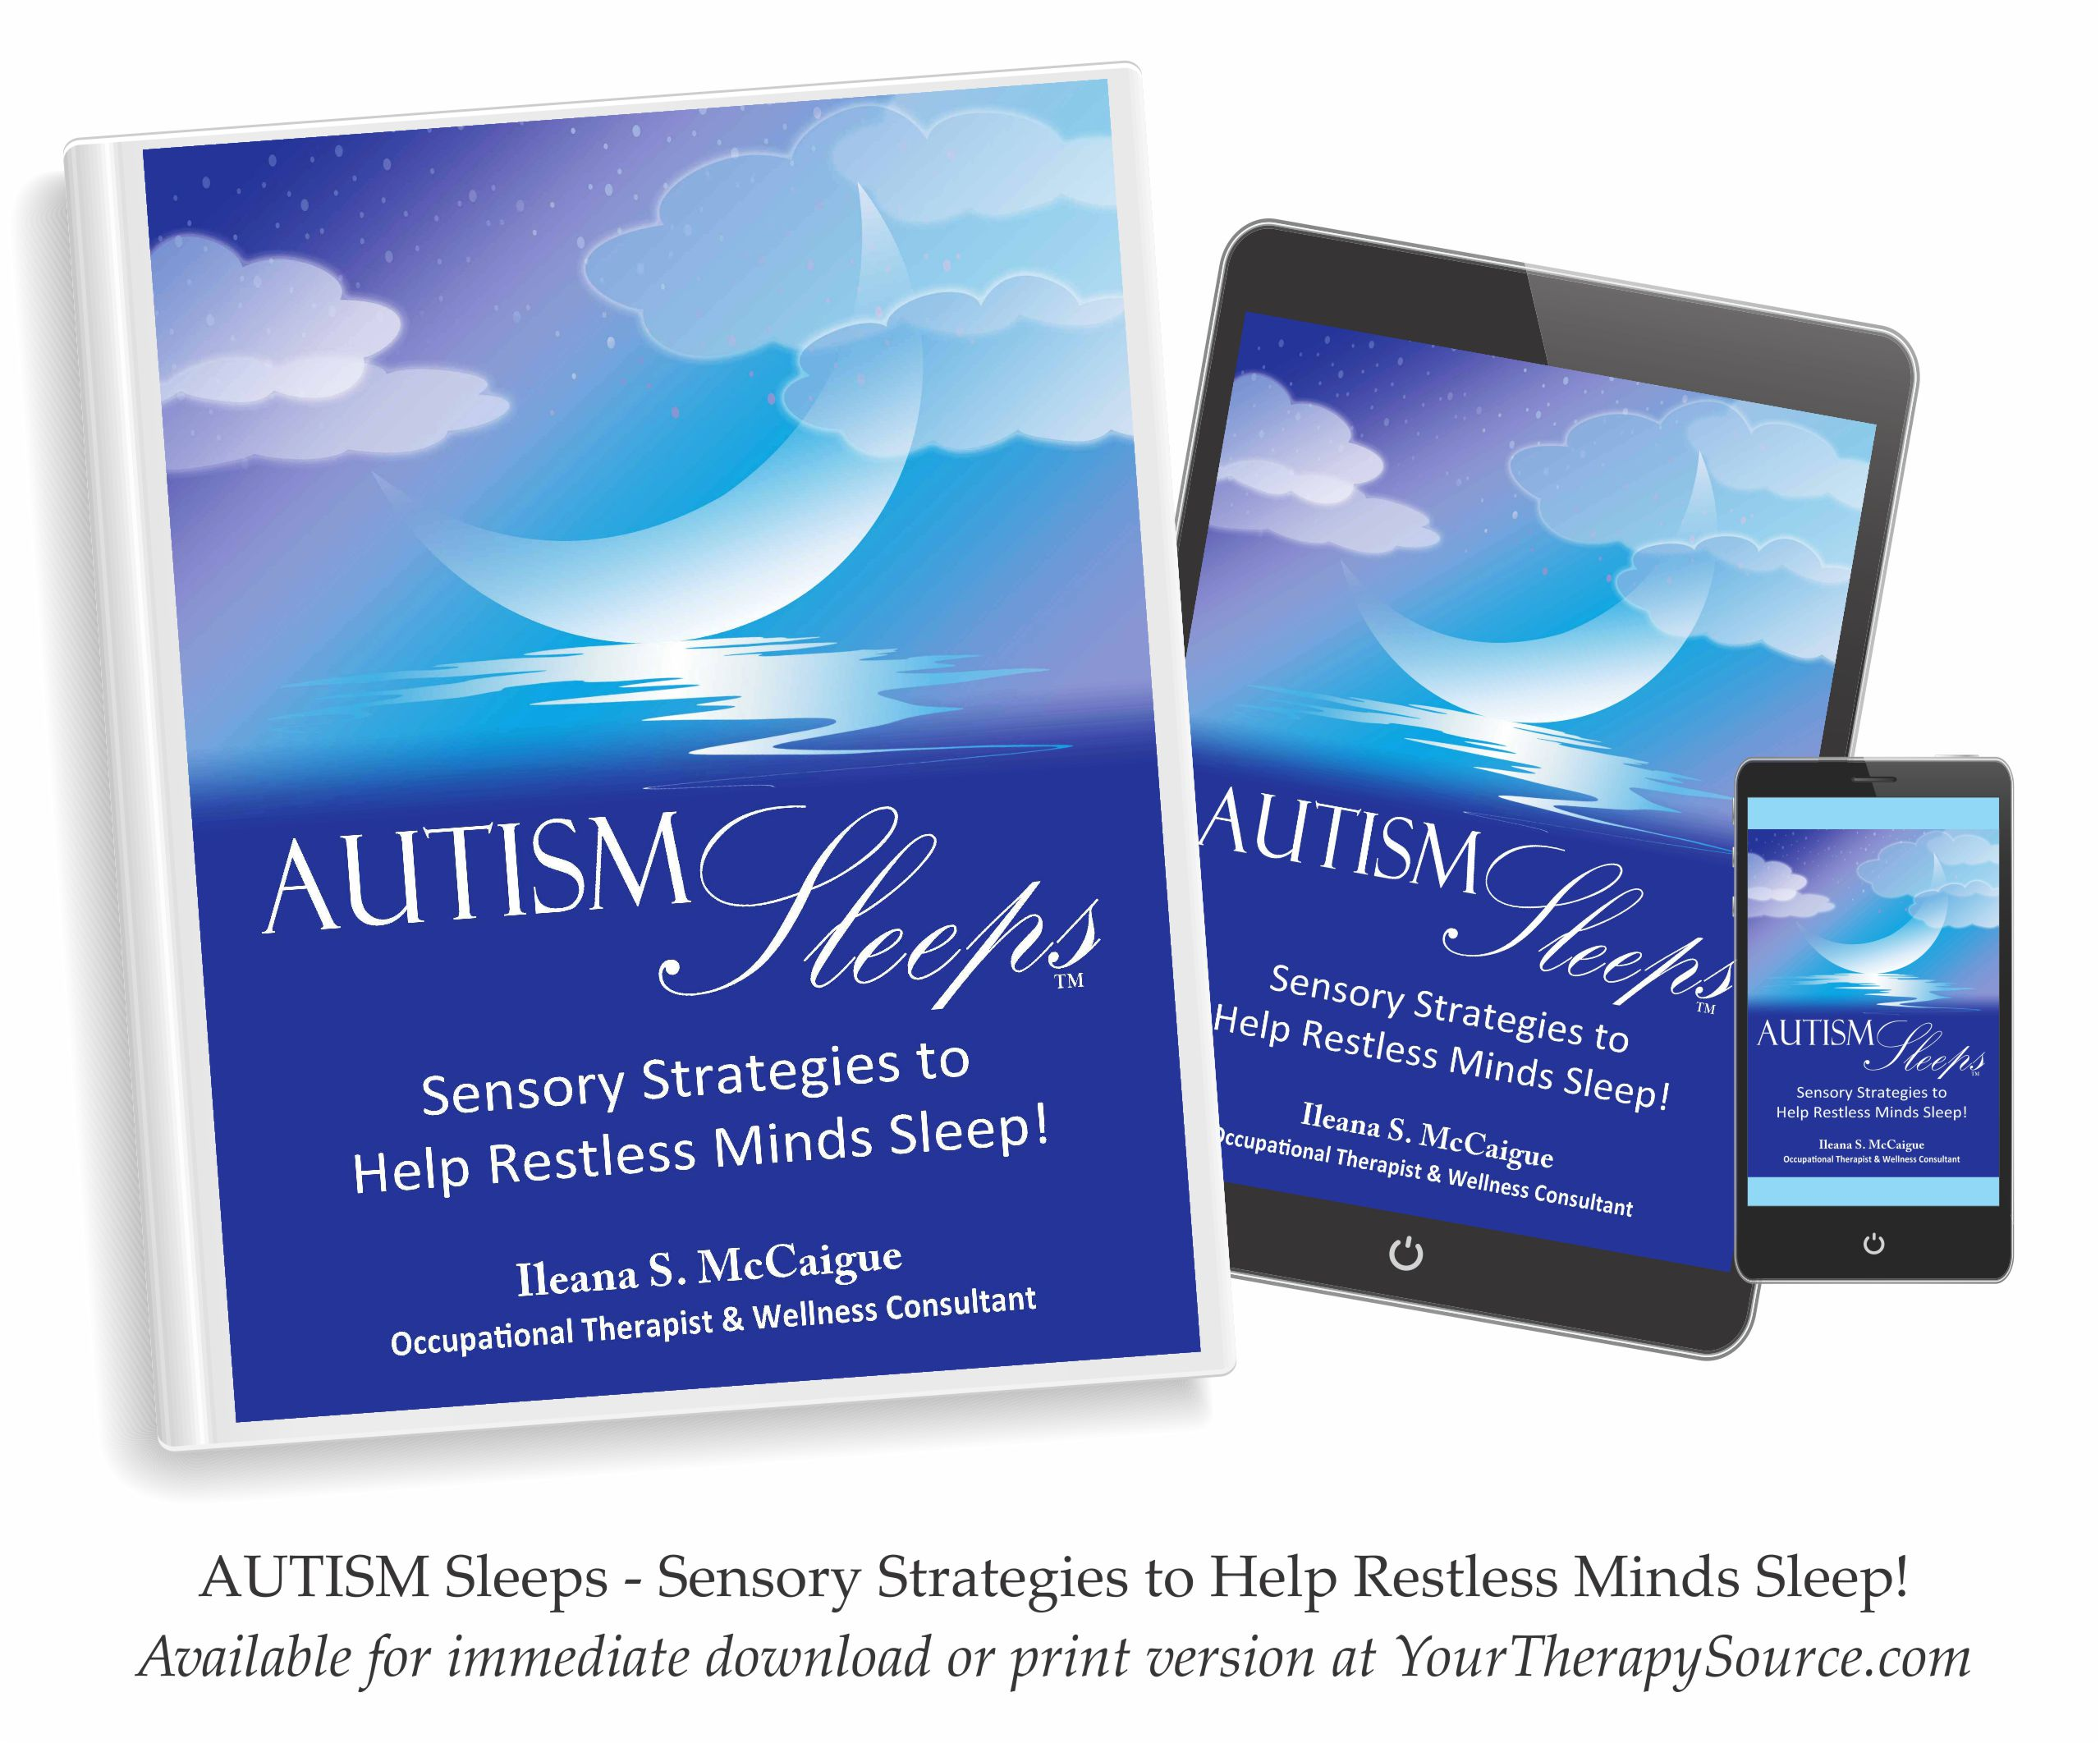 Autism Sleeps - Sensory Strategies to Help with Restless Sleep